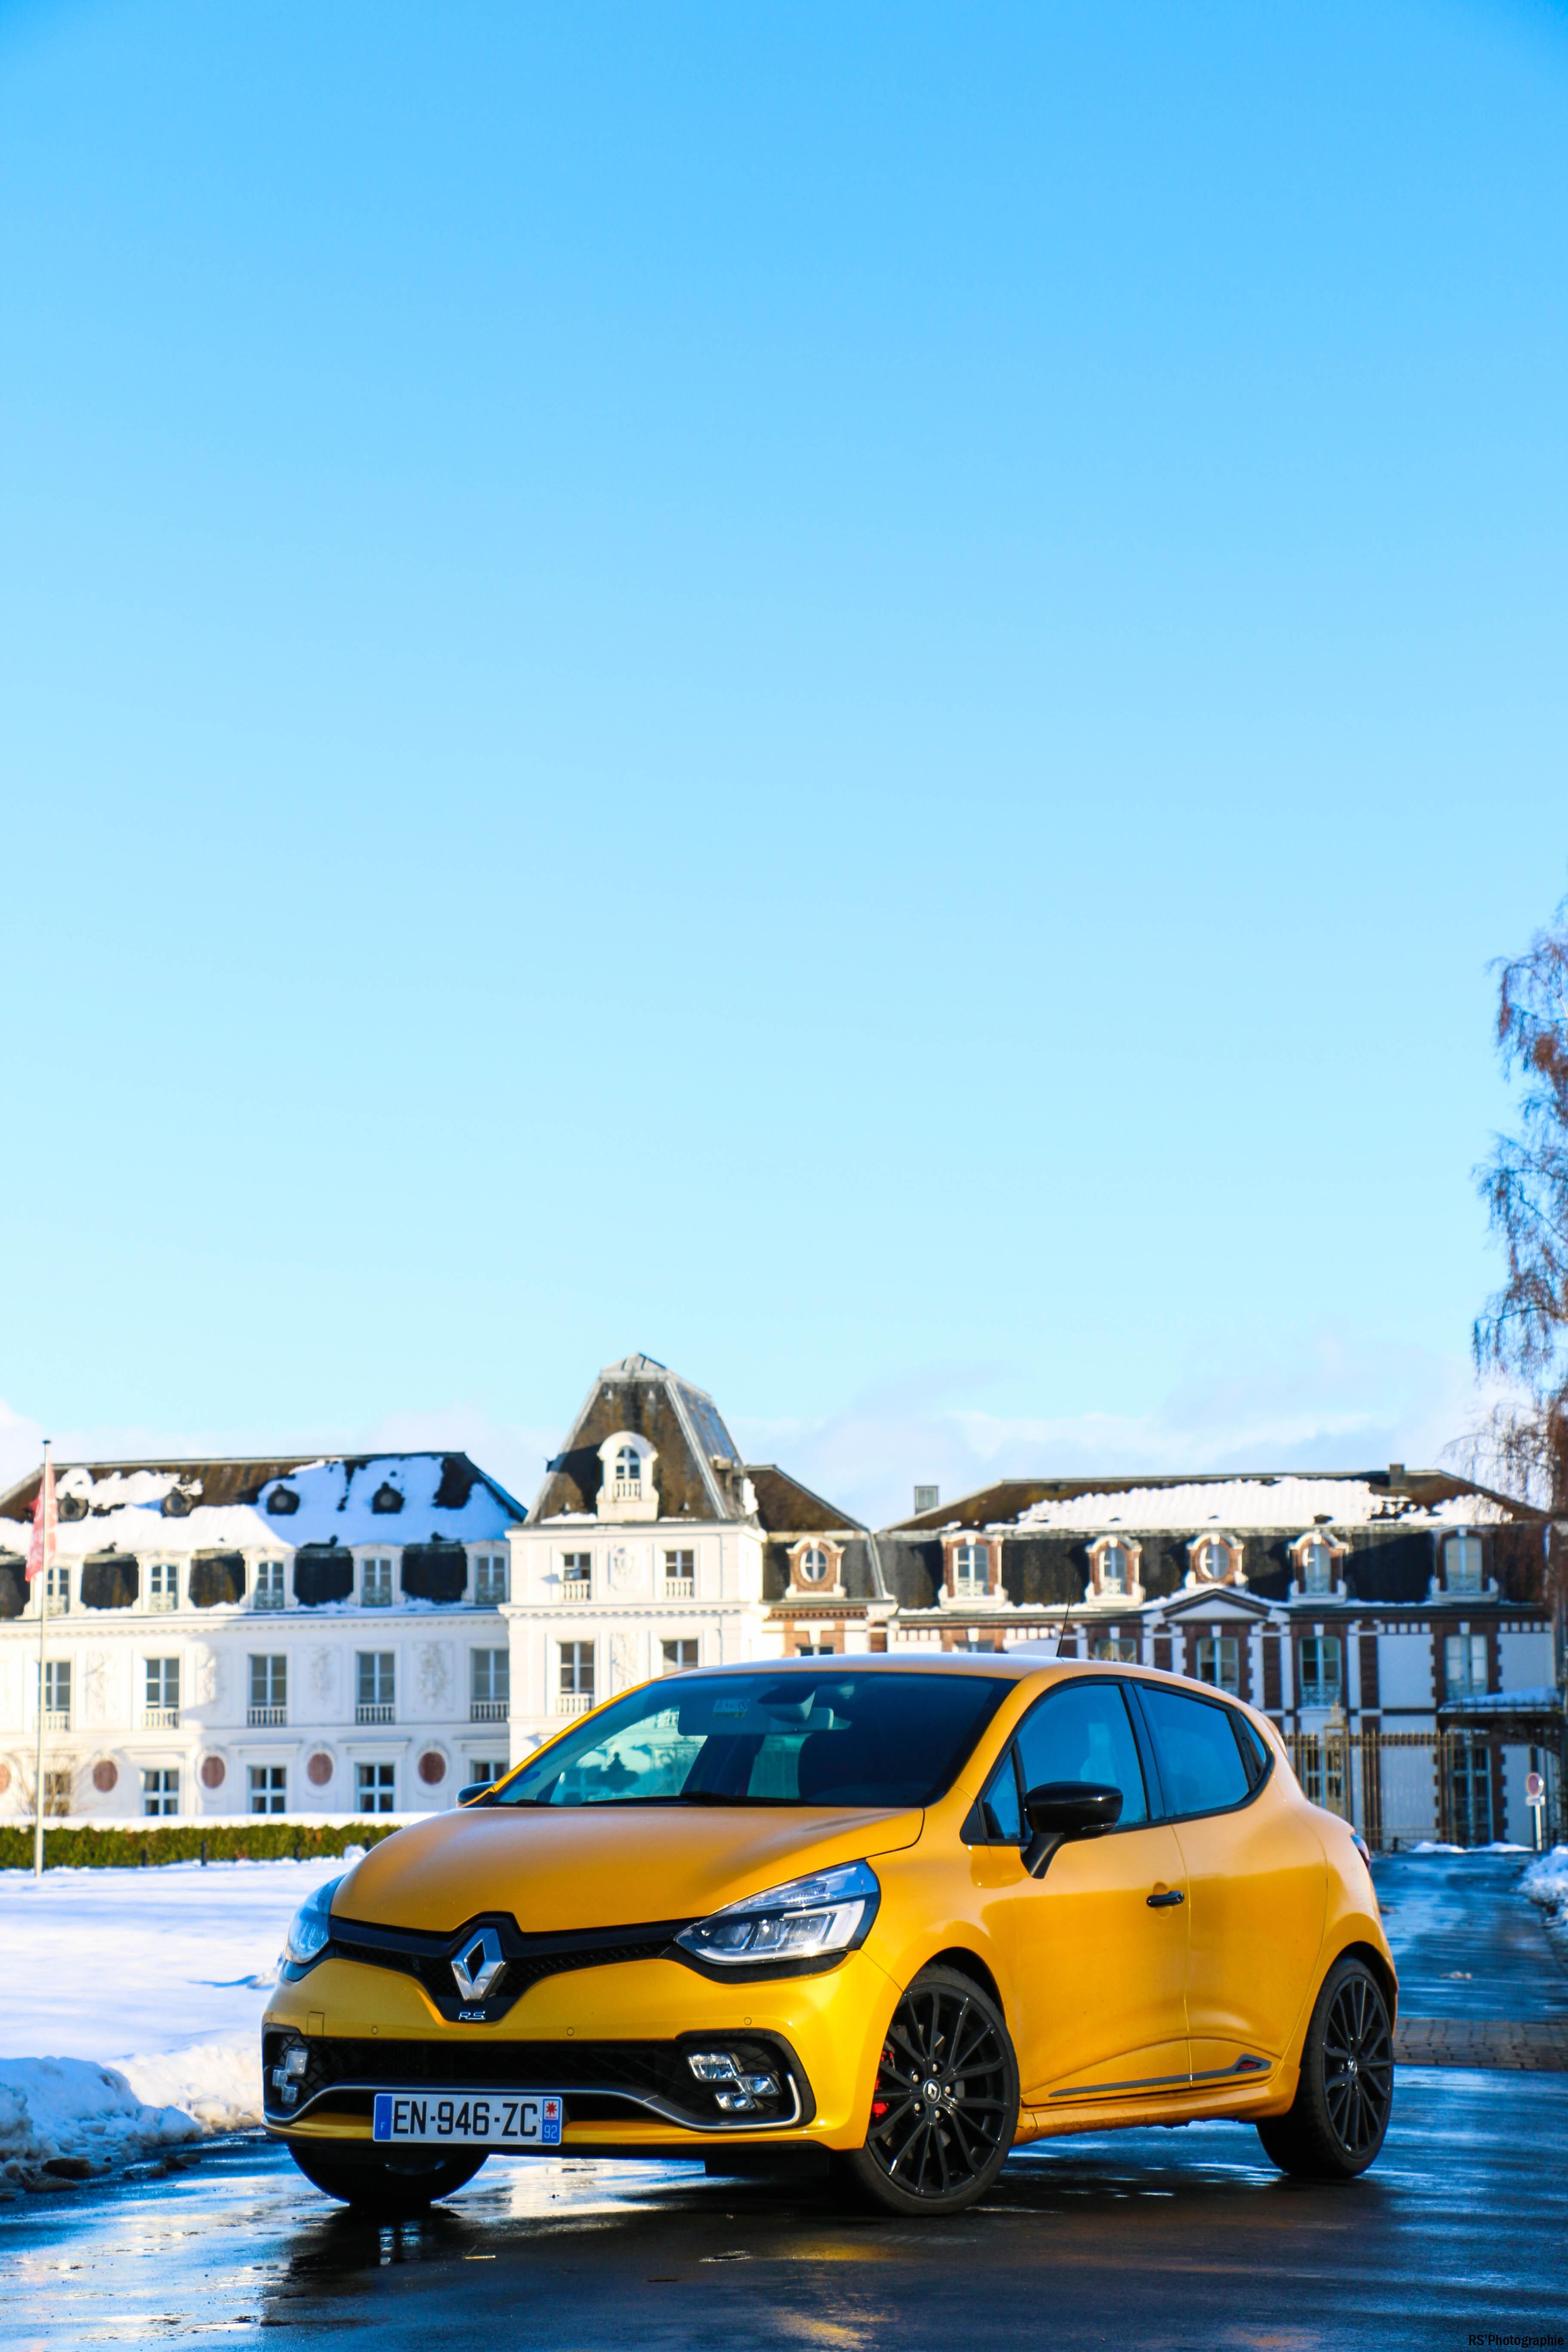 RenaultclioIVRSTrophy7-renault-clio-RS-trophy-avant-front-Arnaud Demasier-RSPhotographie